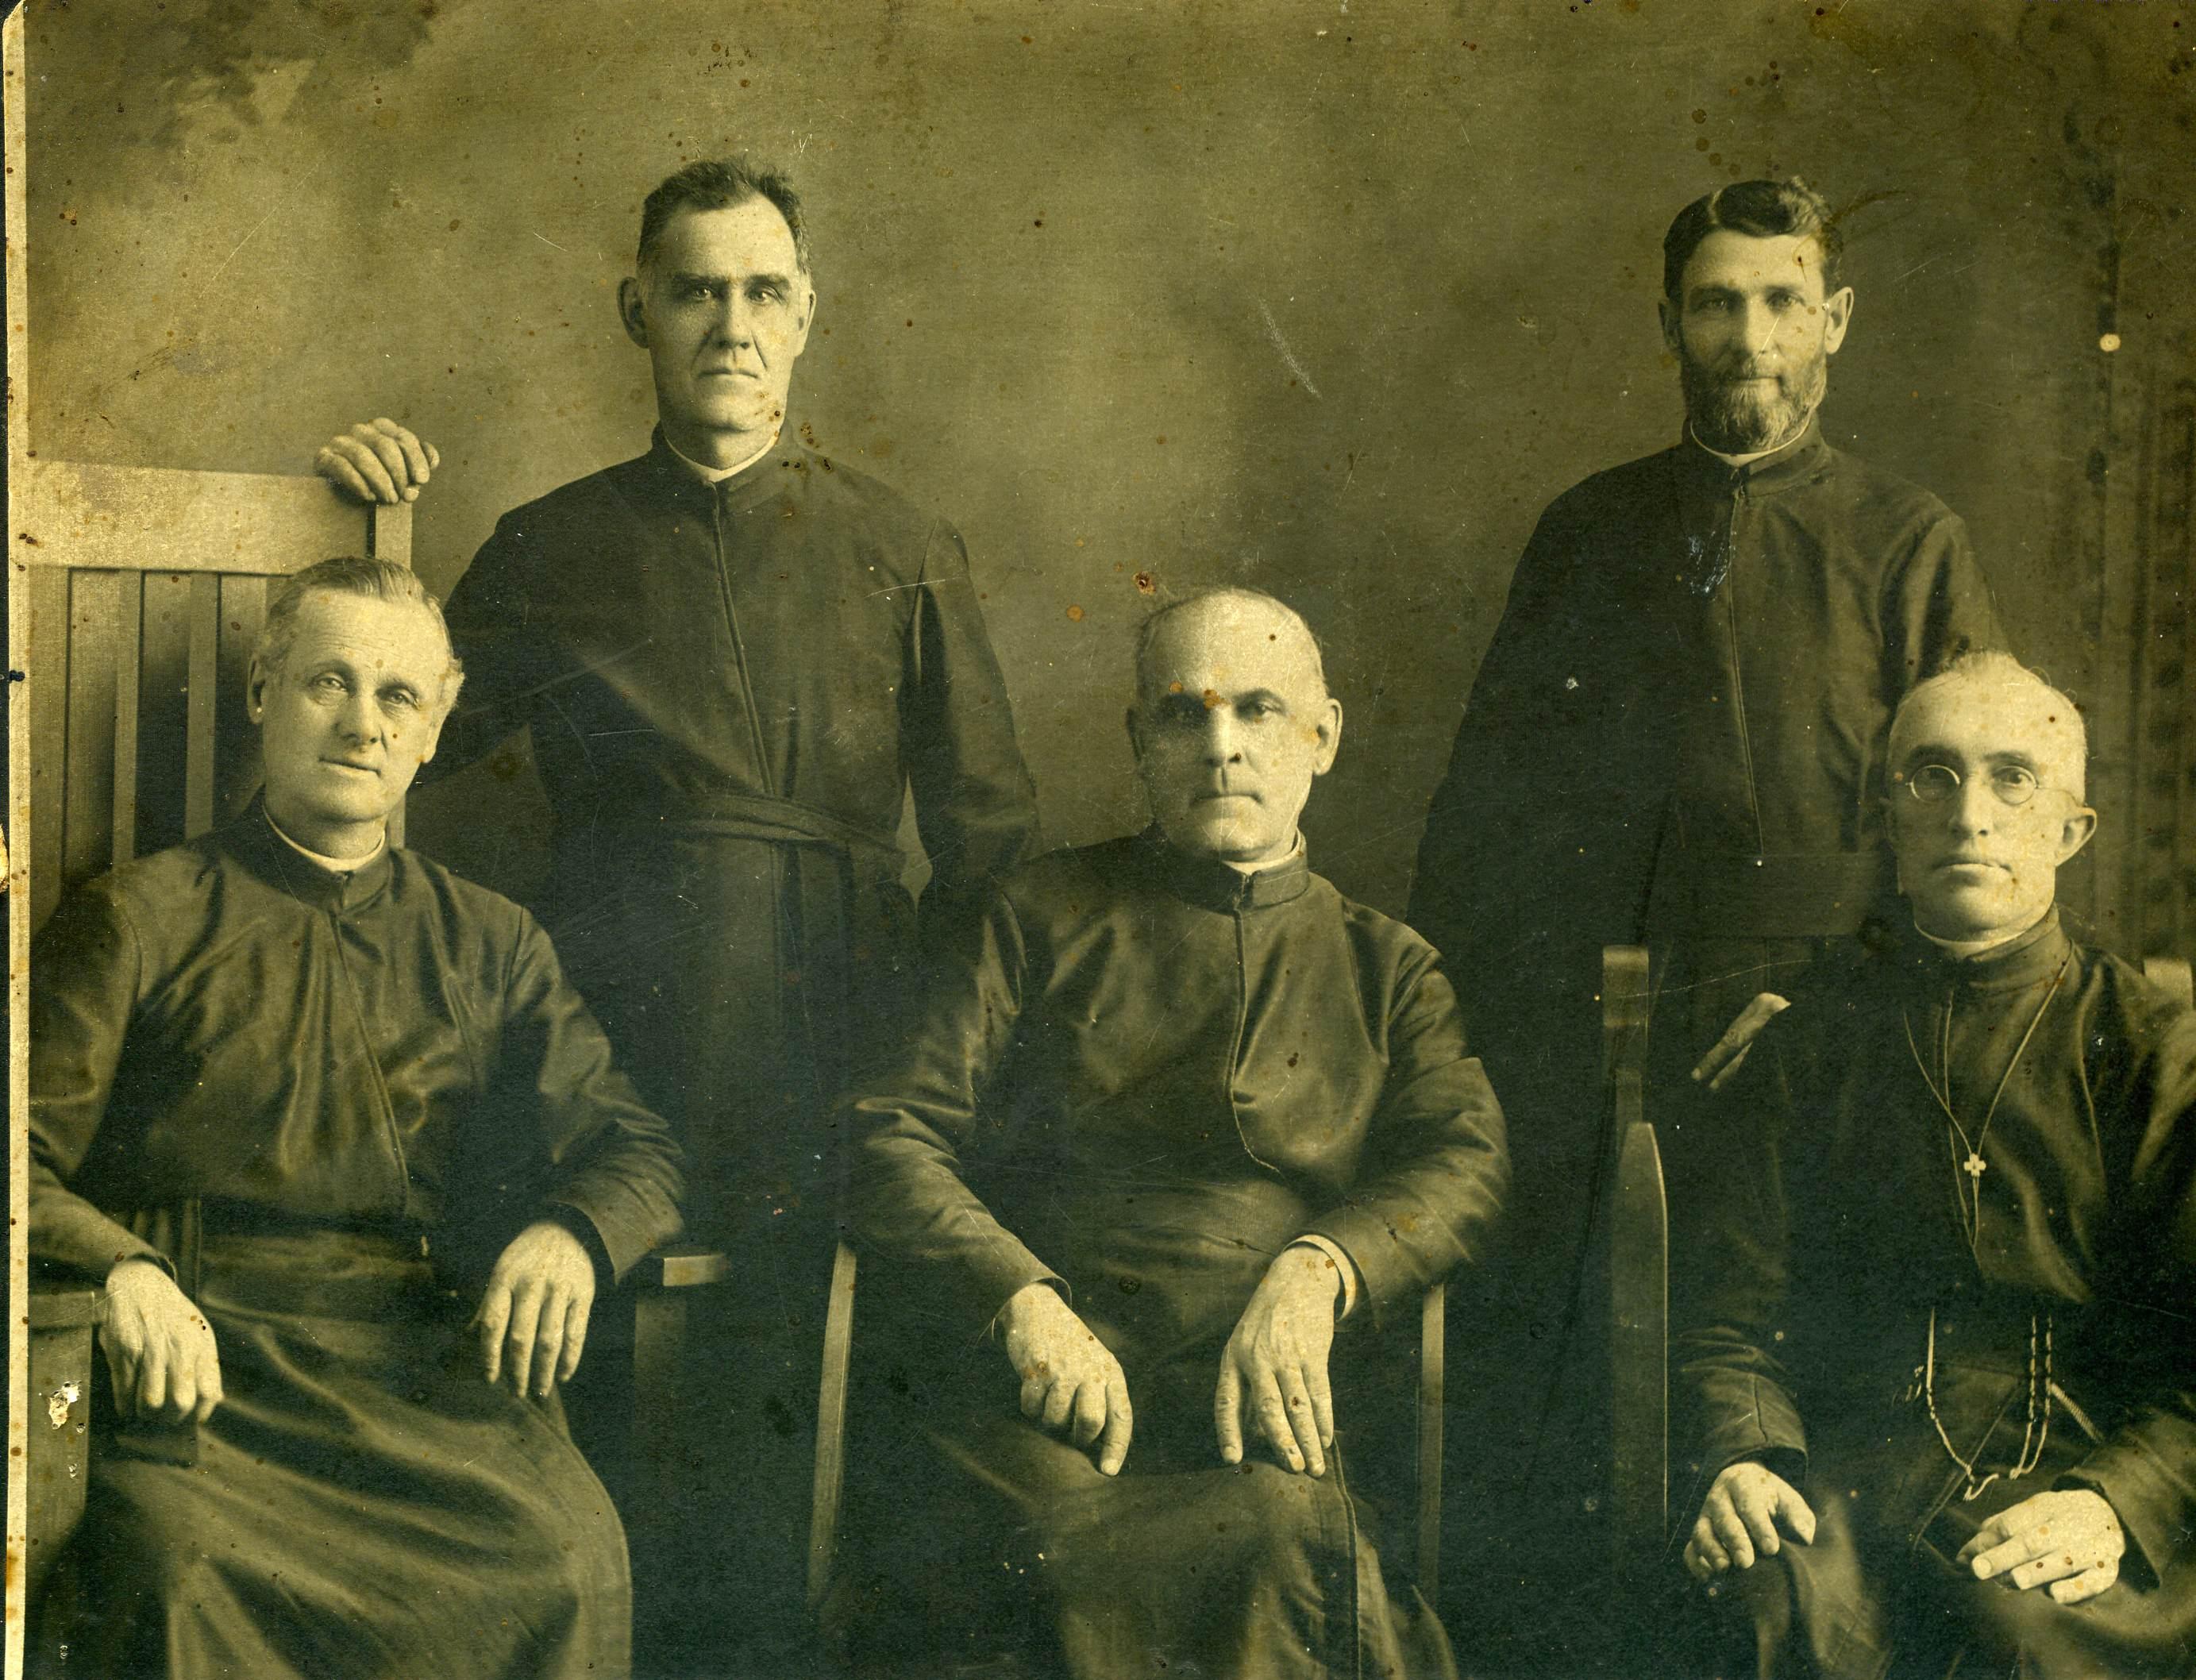 Prêtres 1908